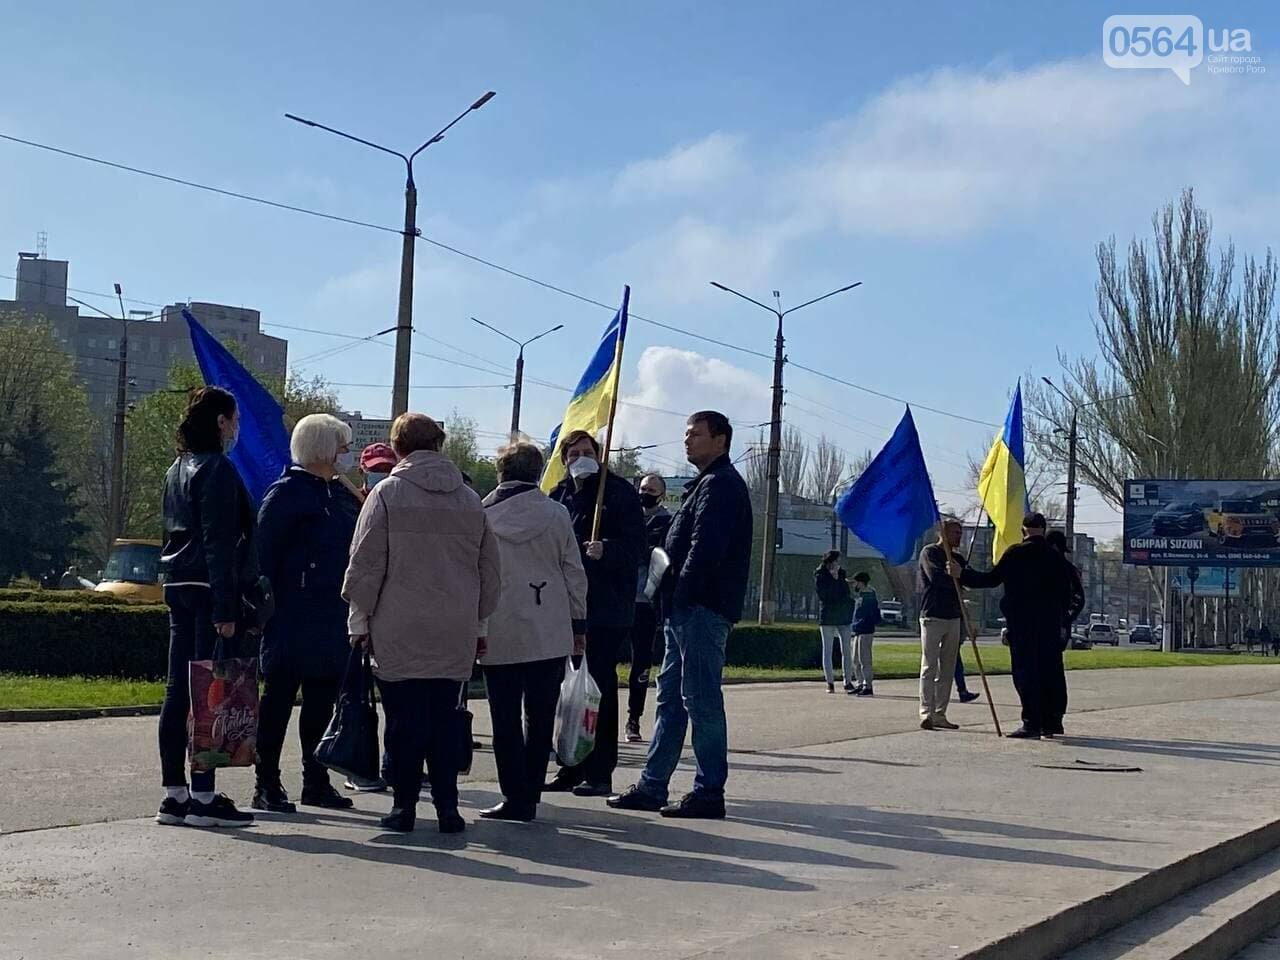 """Мир! Труд! Май!"", ""Зарплату 1000 евро!"", - криворожане вышли на первомайский марш, - ФОТО, ВИДЕО , фото-6"